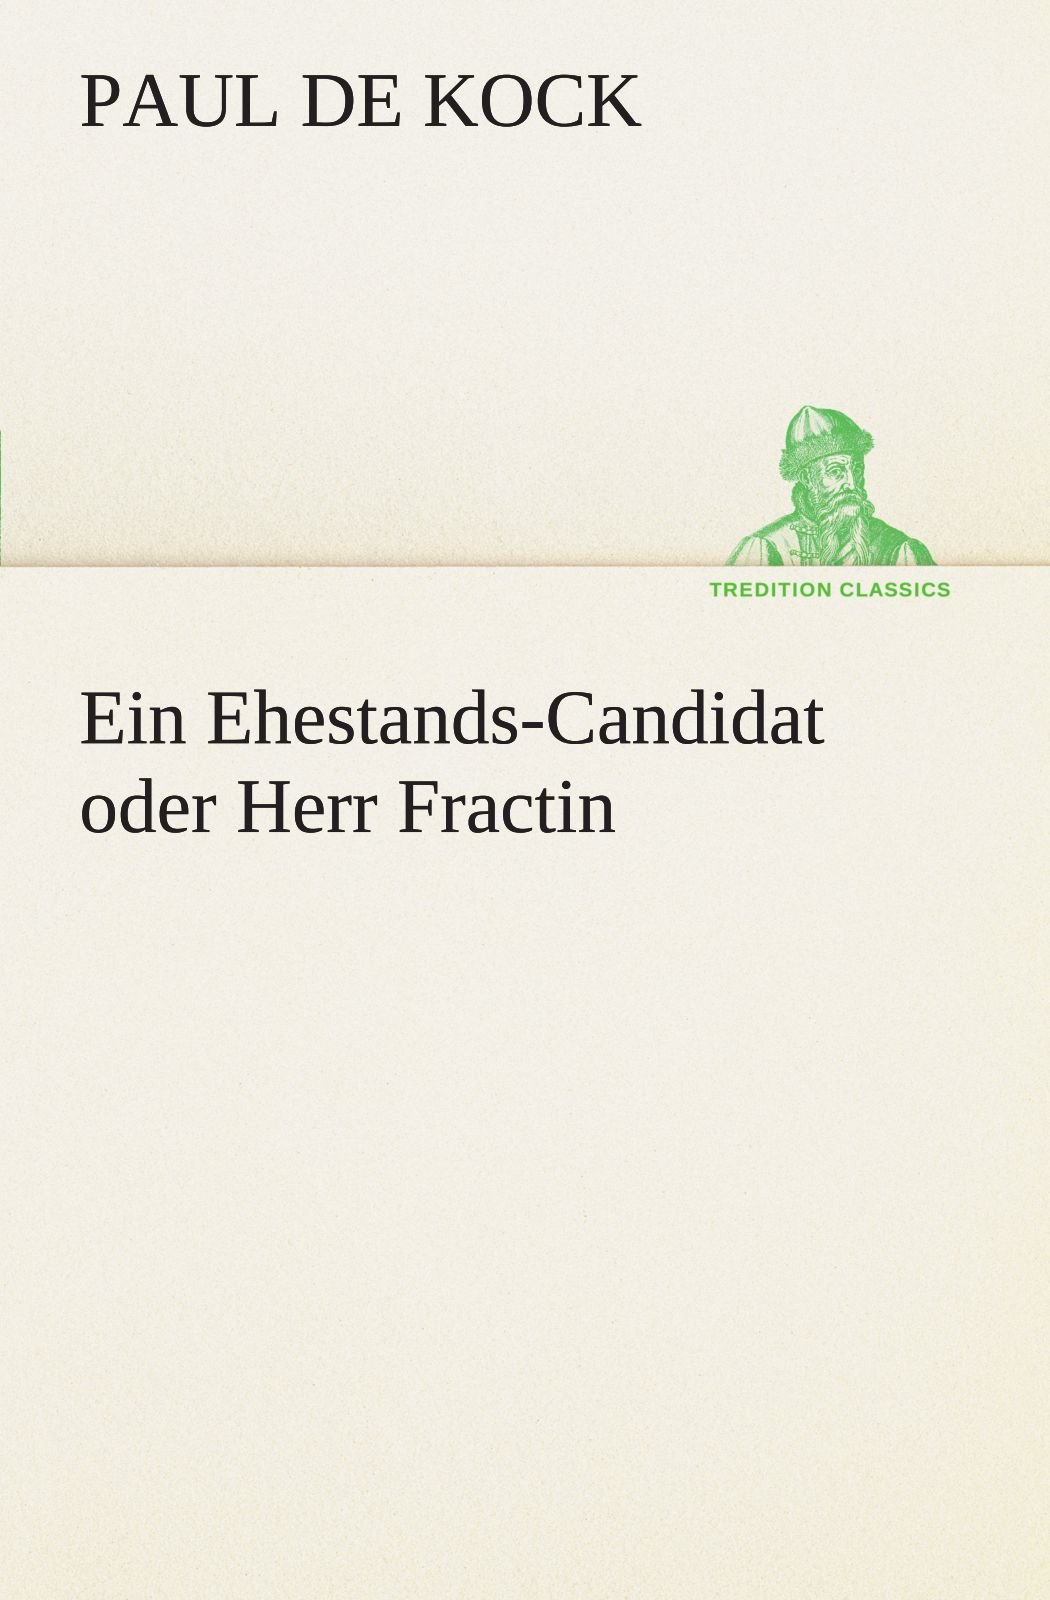 Download Ein Ehestands-Candidat oder Herr Fractin (TREDITION CLASSICS) (German Edition) pdf